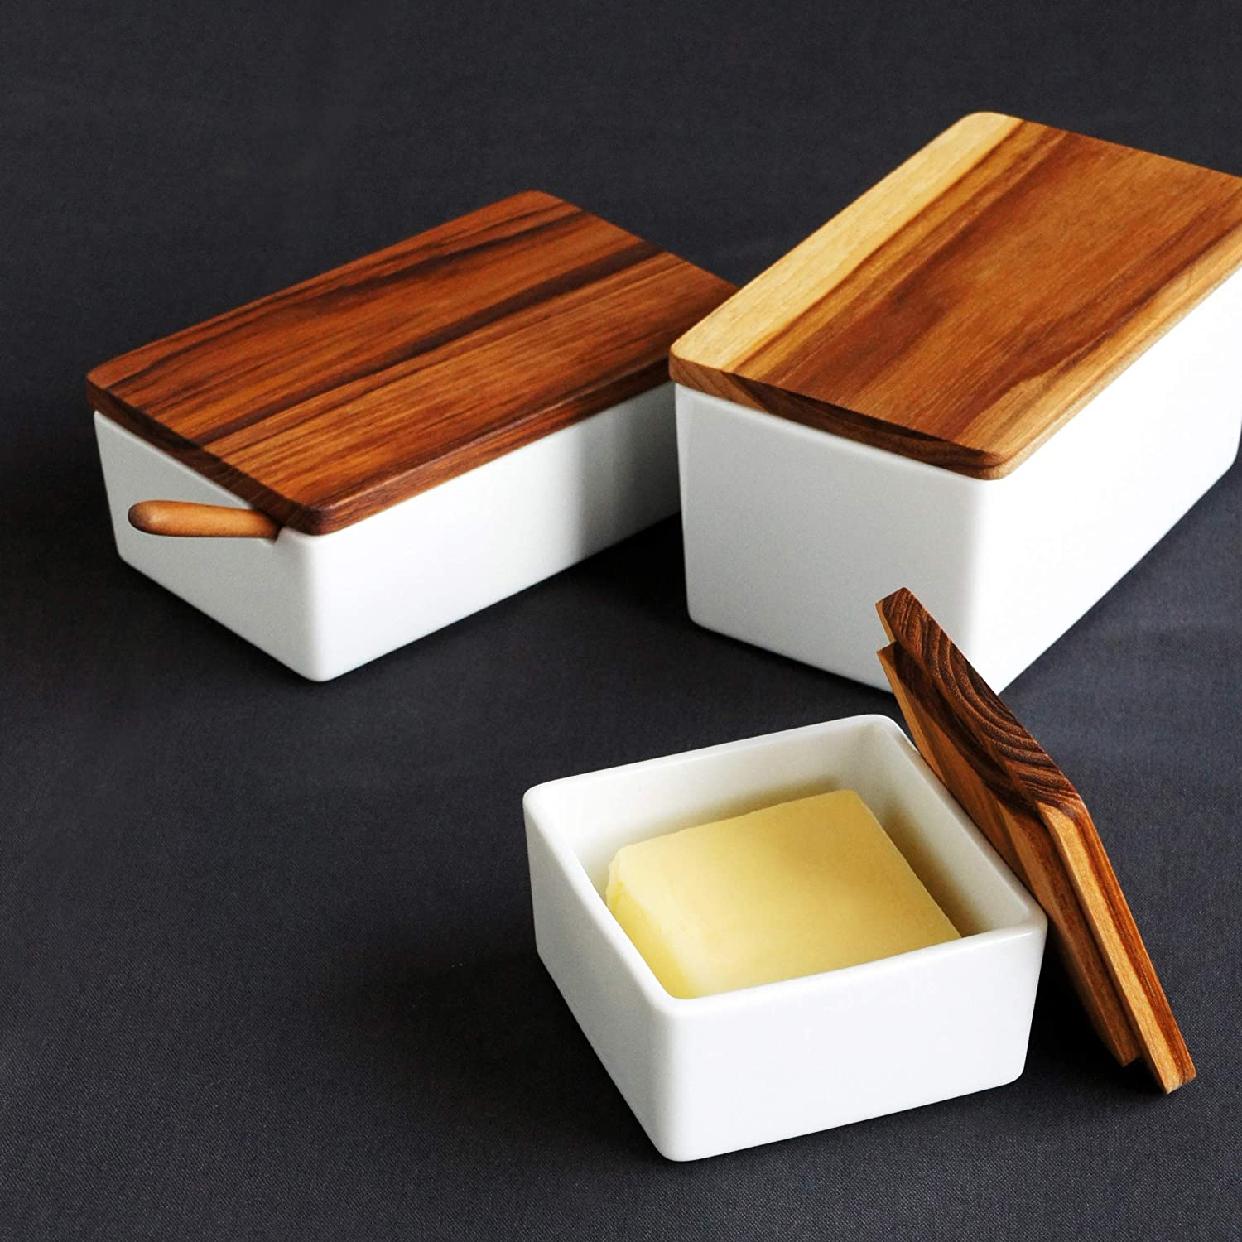 B STYLE KITCHEN(ビースタイルキッチン)木製バターケース 32401の商品画像4